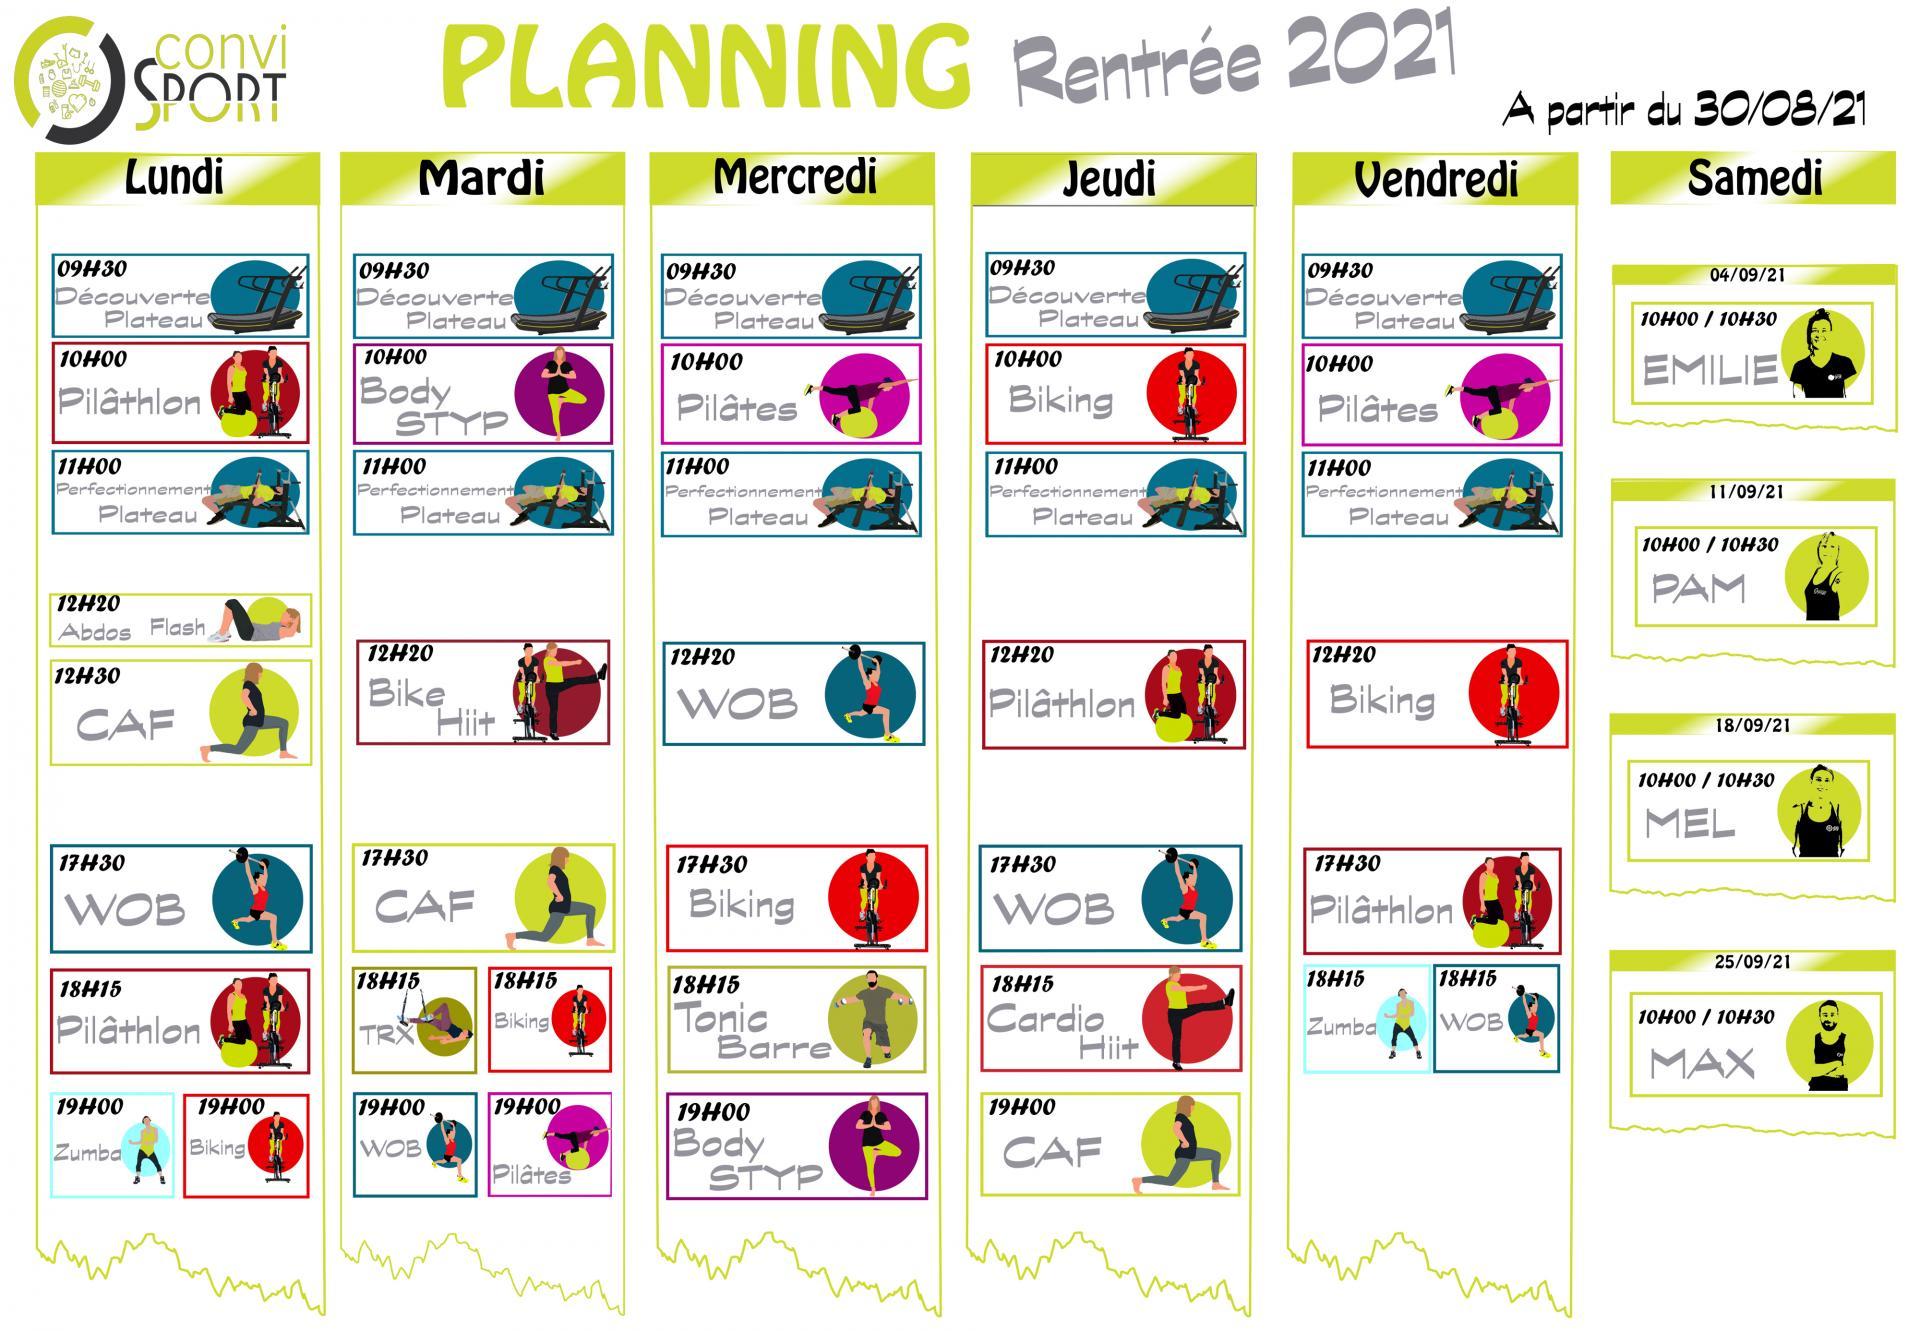 Planning rentree 2021